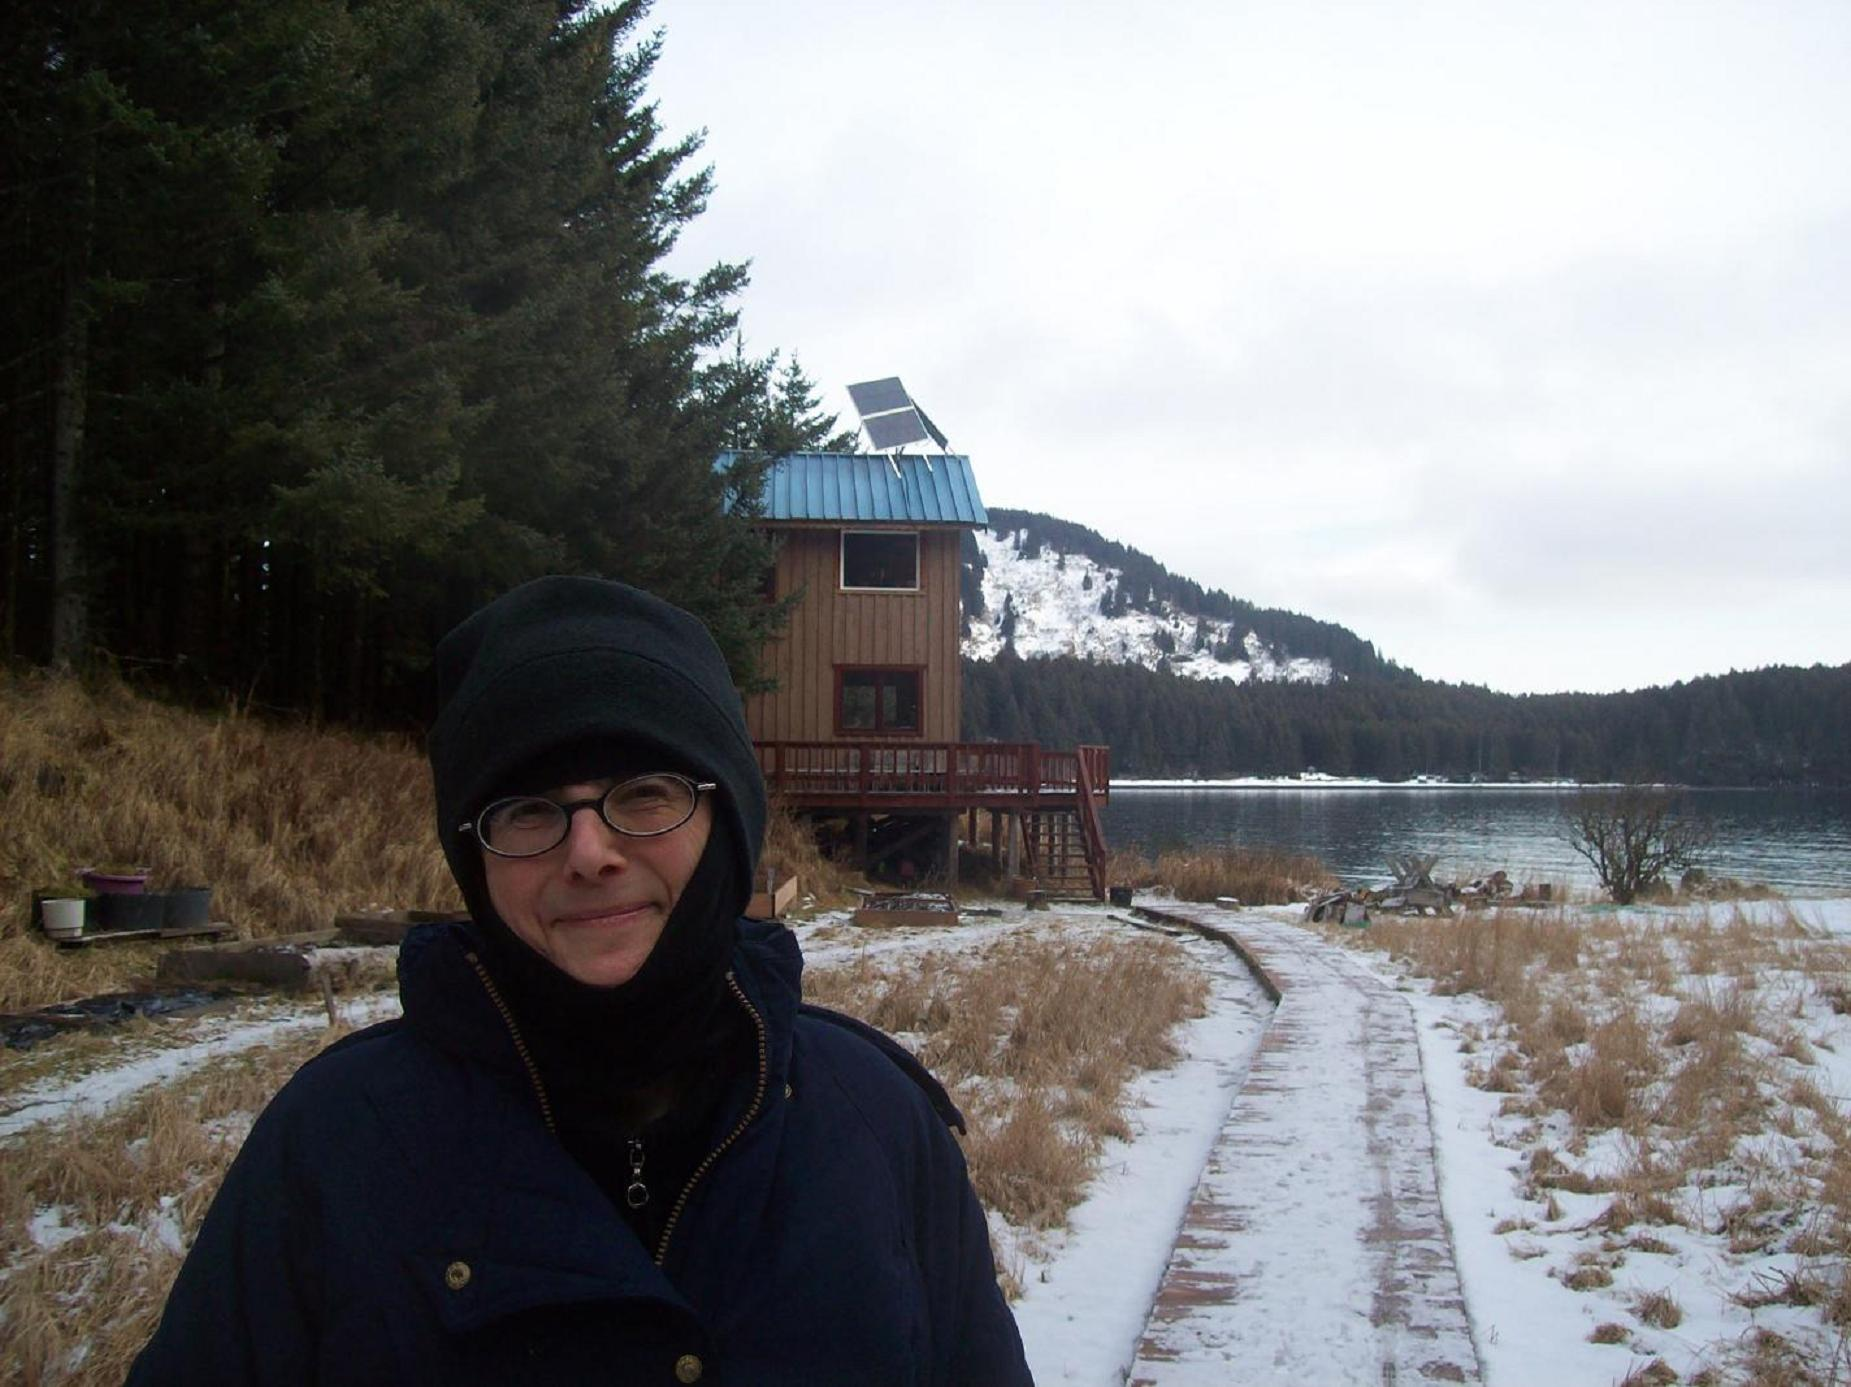 25 La revedere, Maica ( Nilus Island, Alaska)